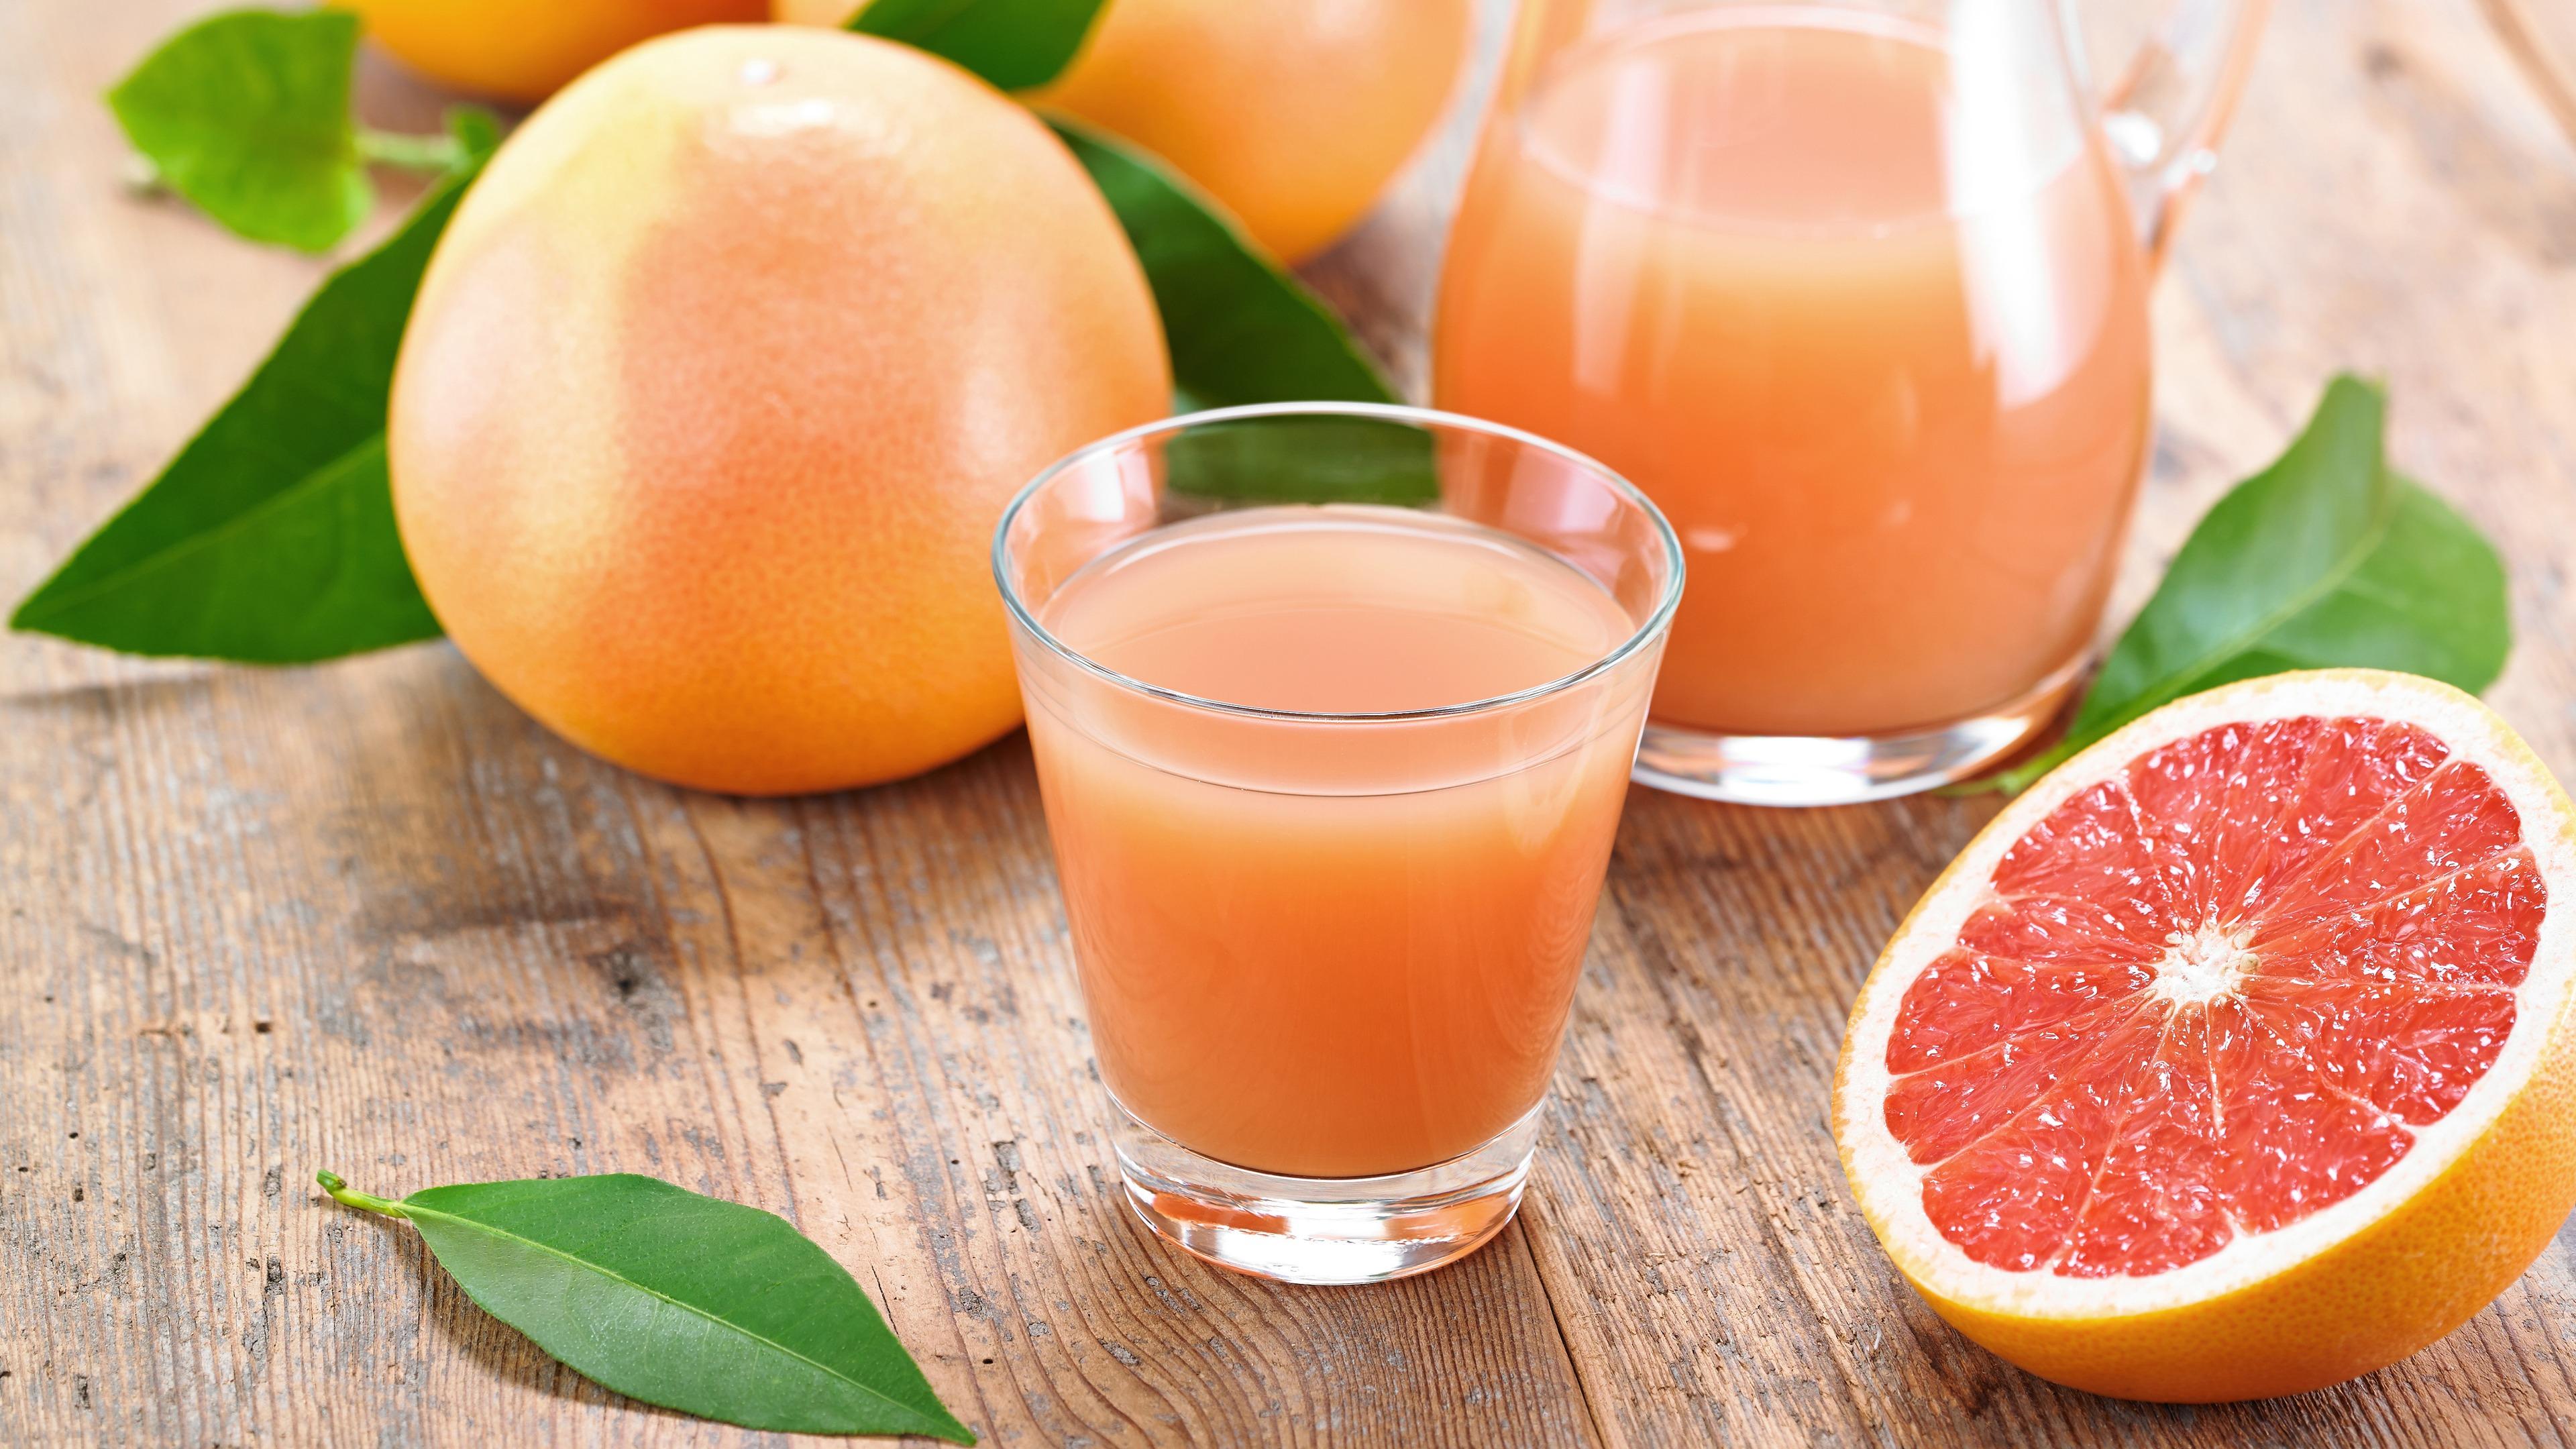 Download wallpaper 3840x2160 grapefruit juice fruit citrus 4k 3840x2160